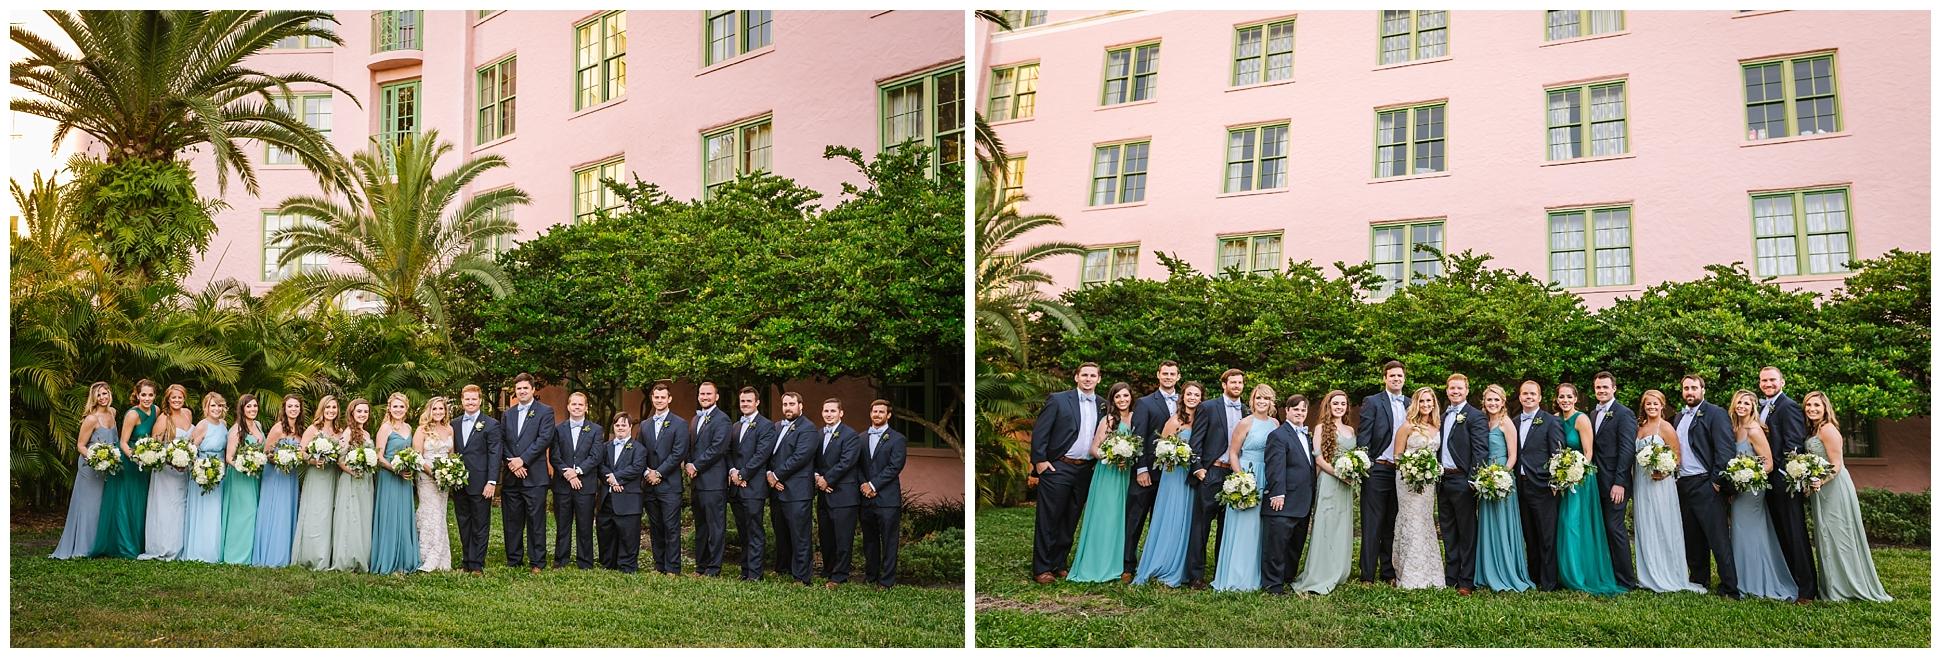 St-pete-wedding-photographer-grand-ballroom-vinoy-tea-garden-greek-luxury_0144.jpg